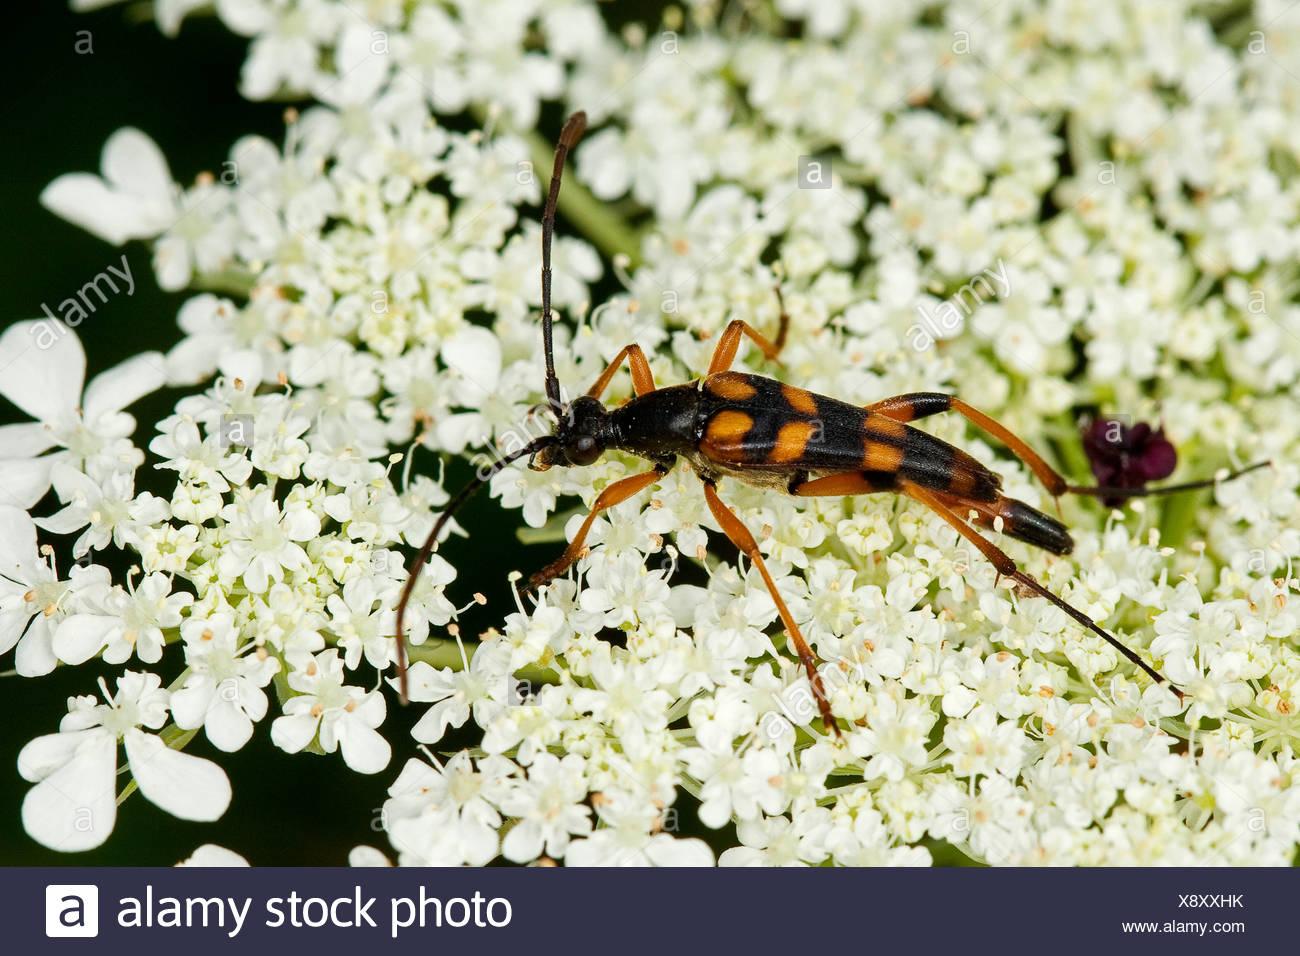 Long-horned beetle (Strangalia attenuata, Typocerus attenuata, Leptura attenuata), on blossoms, Germany - Stock Image